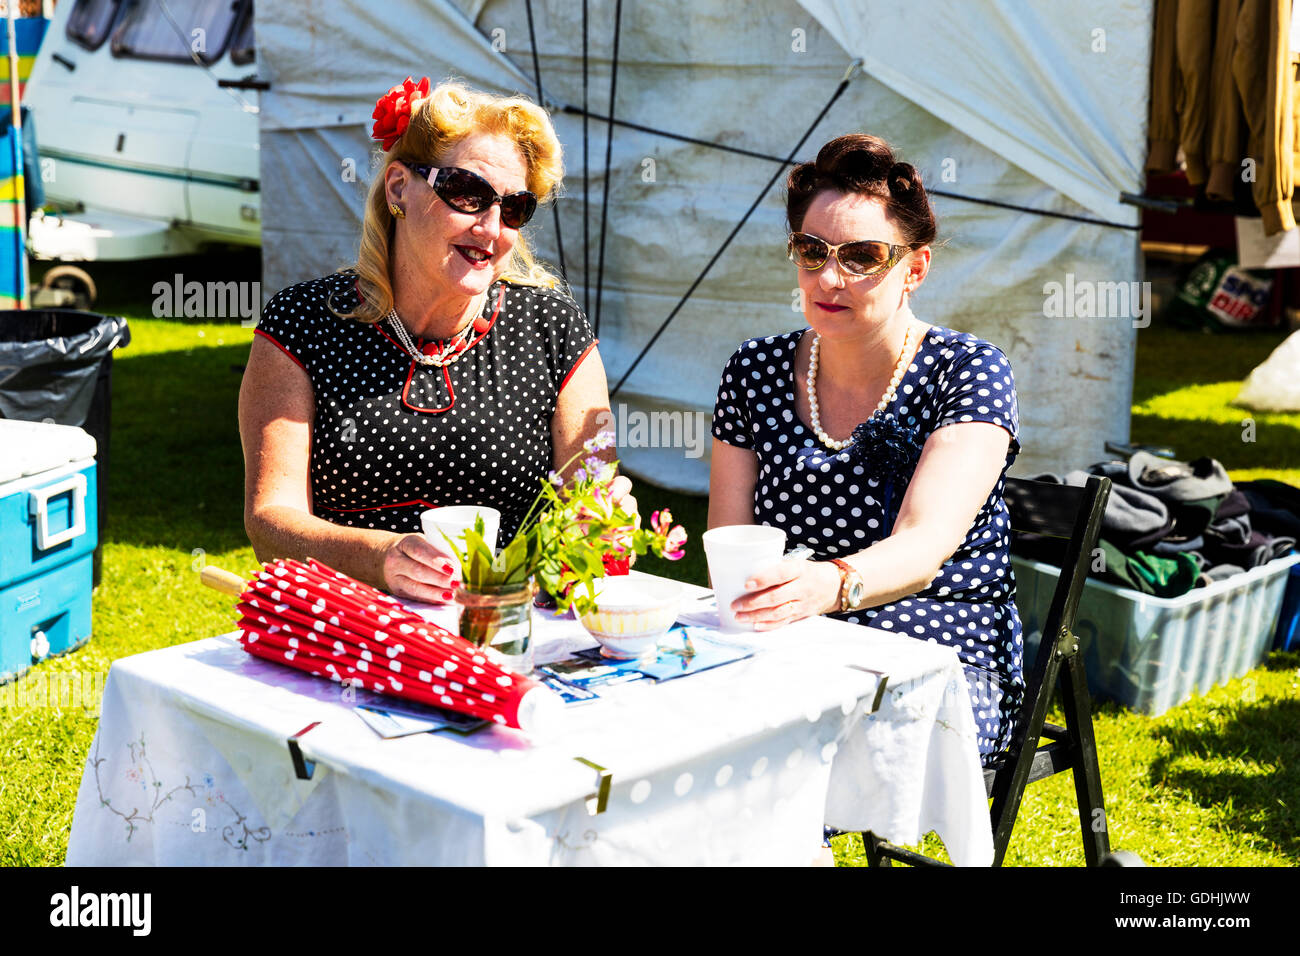 English tea outside 2 women drinking tea wearing polker dot dress dresses 1940's style traditional dress attire - Stock Image